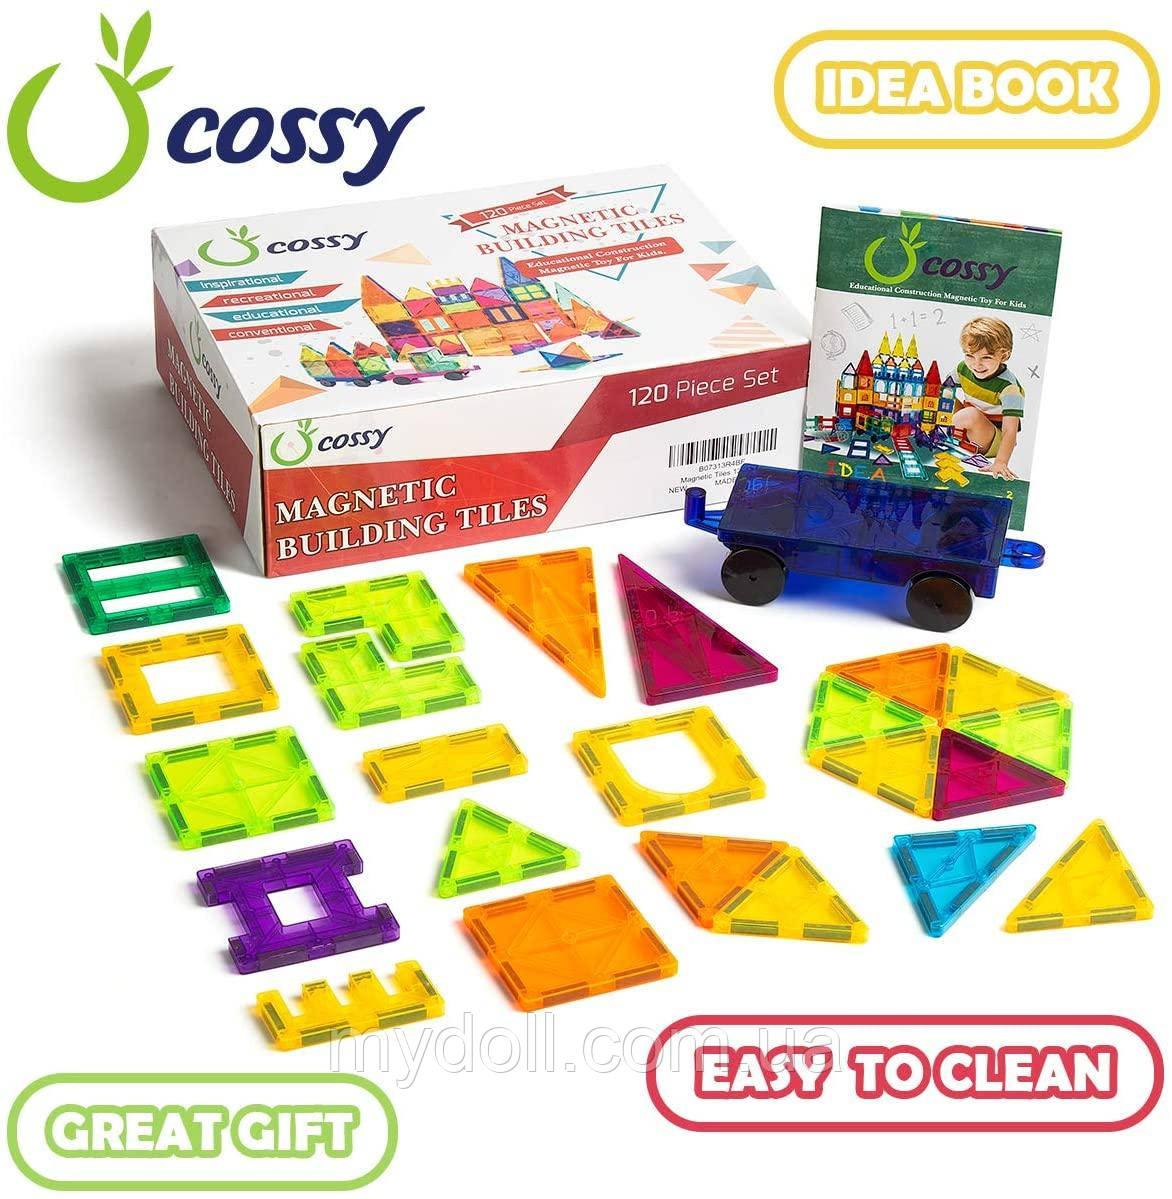 Магнітний конструктор cossy Kids Magnet Toys Magnetic Tiles, 120 PCs Magnetic Building Blocks with Car 2